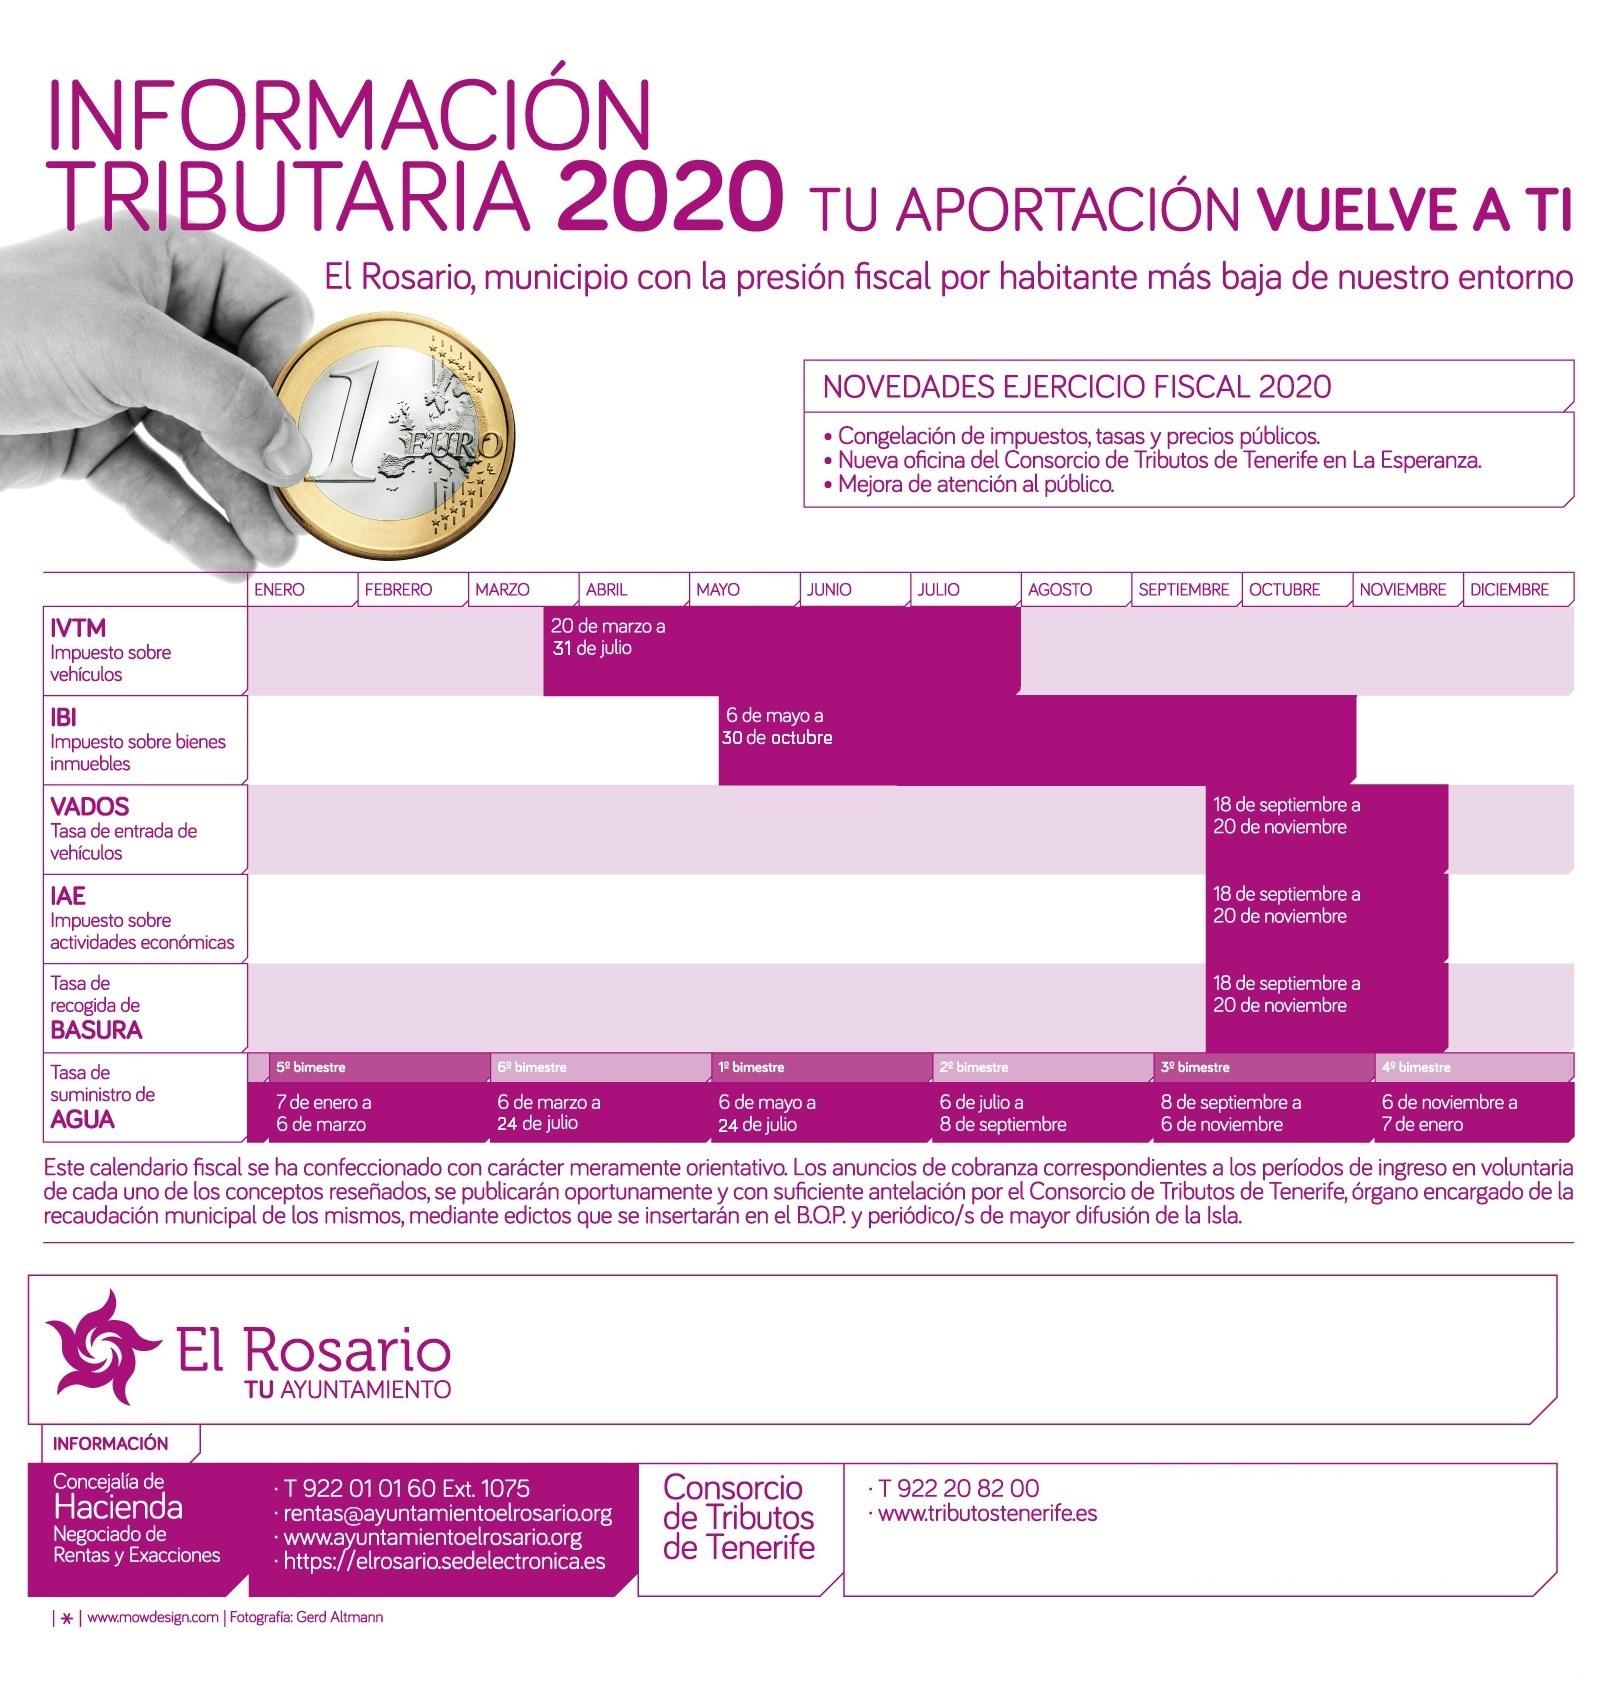 CALENDARIO_FISCAL_2020-DIP-190x340-20200217-02af-redes - copia